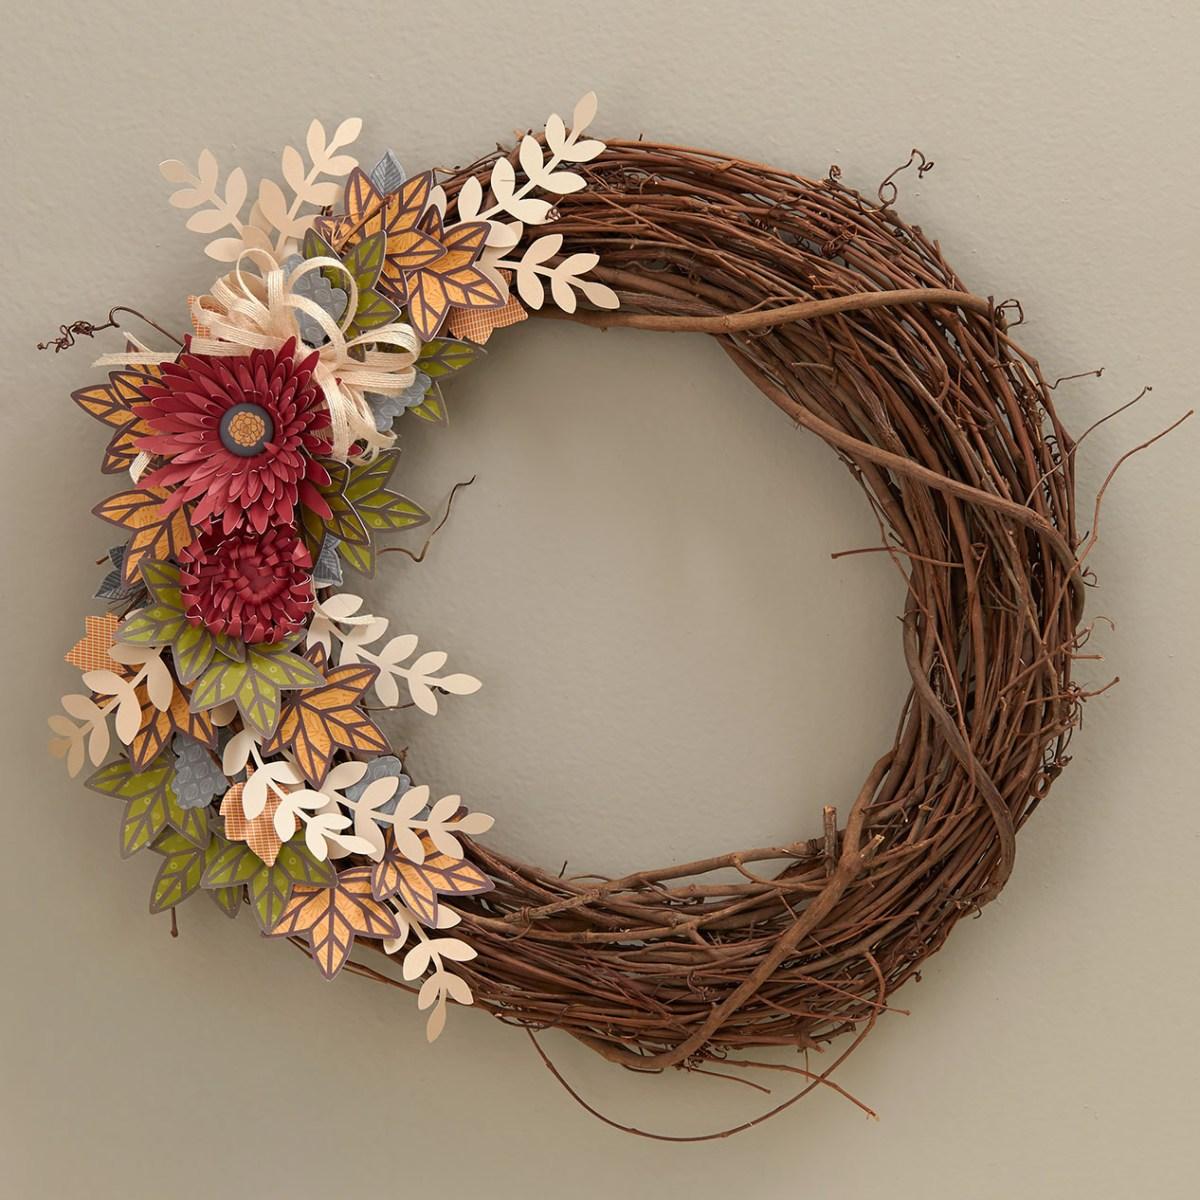 Papercrafting Wreath #papercrafting #cricut #flowermarket #diy #CTHM #closetomyheart #fall #autumn #wreath #paperwreath